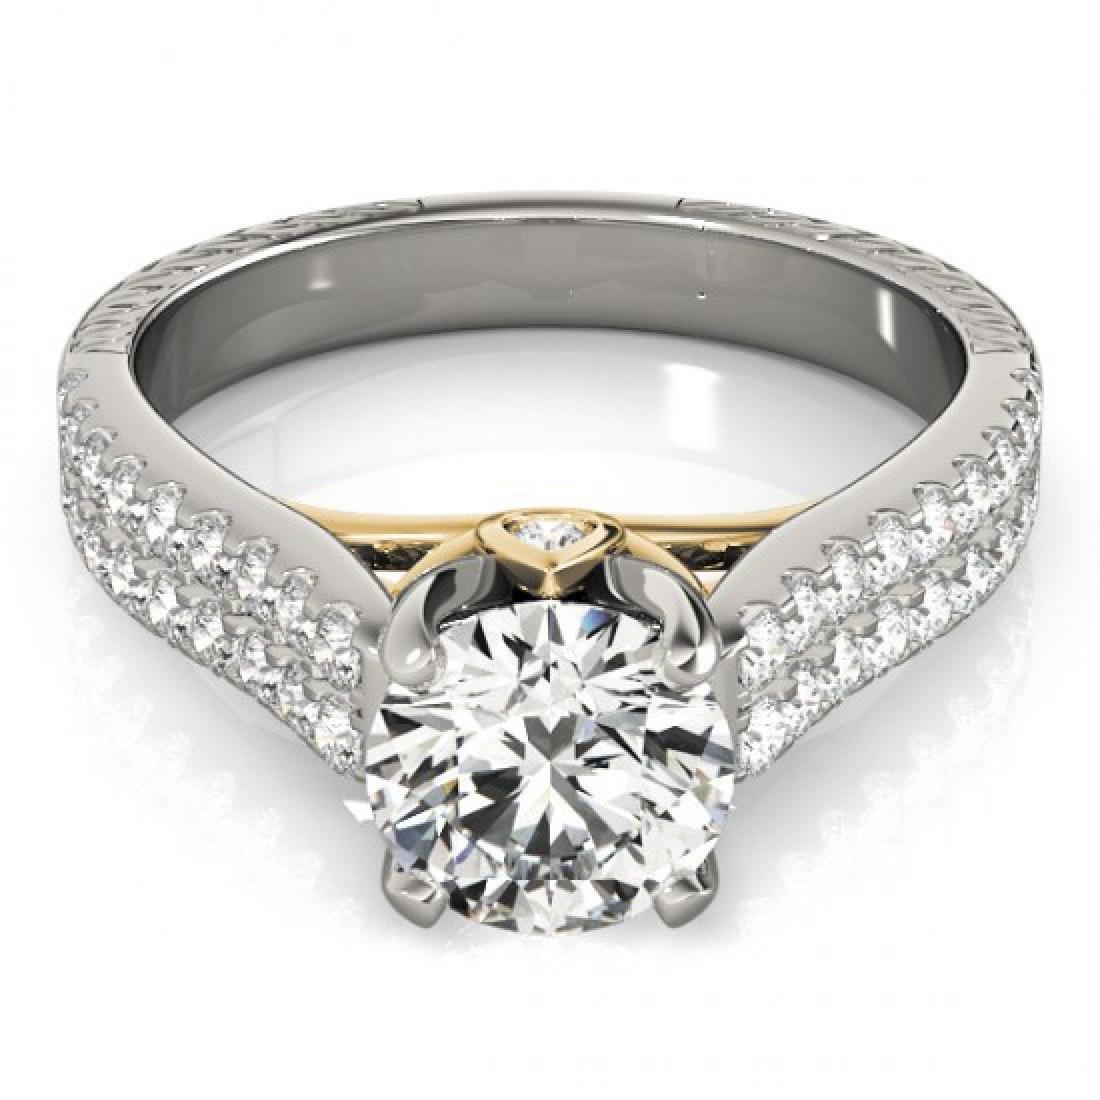 1.61 CTW Certified VS/SI Diamond Pave Ring 14K White &